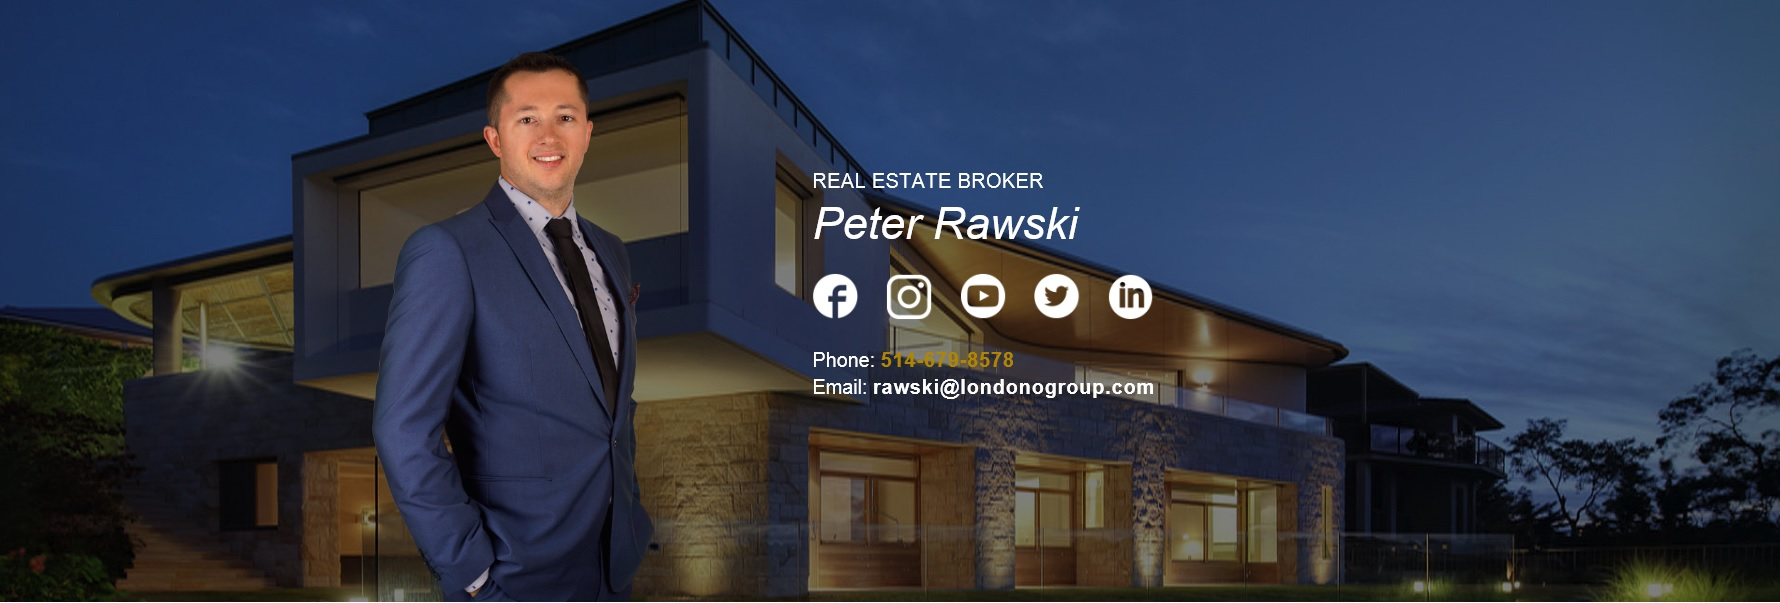 Peter Rawski